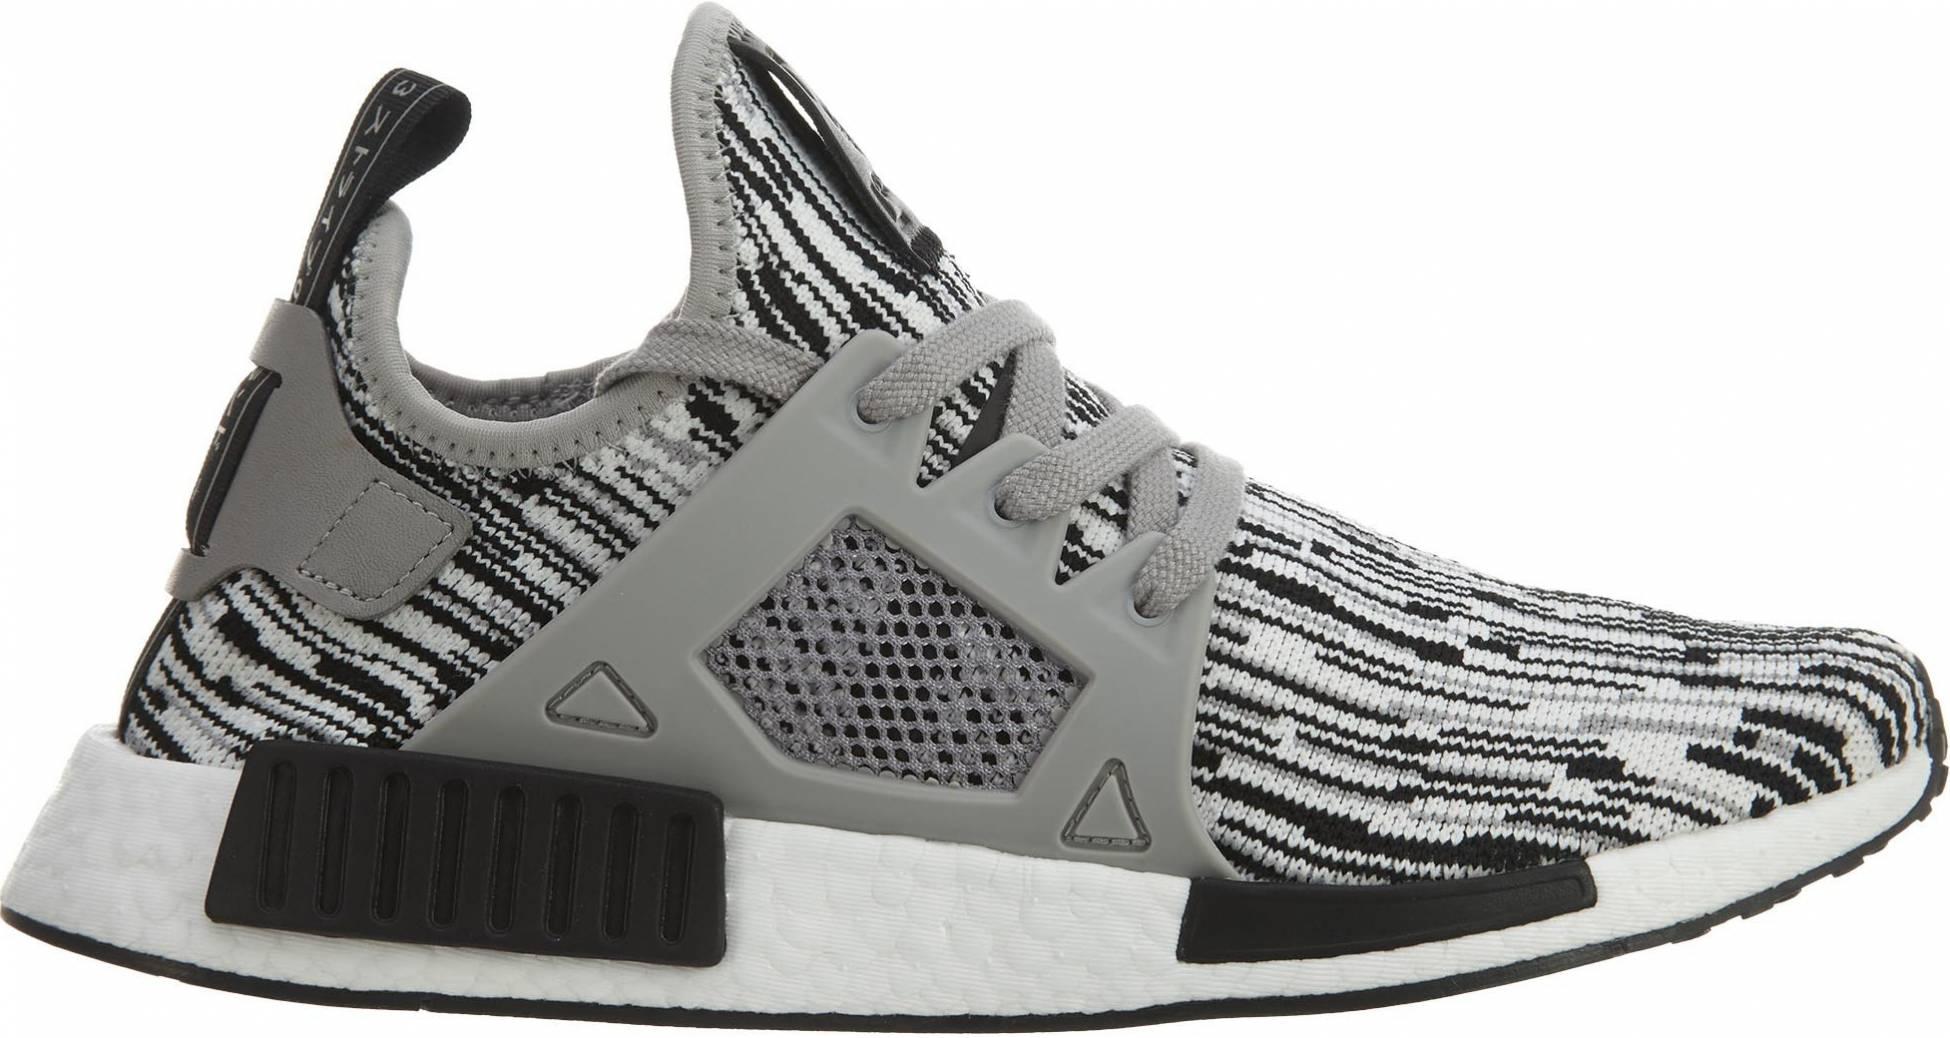 Adidas NMD_XR1 Primeknit sneakers in 5 colors   RunRepeat